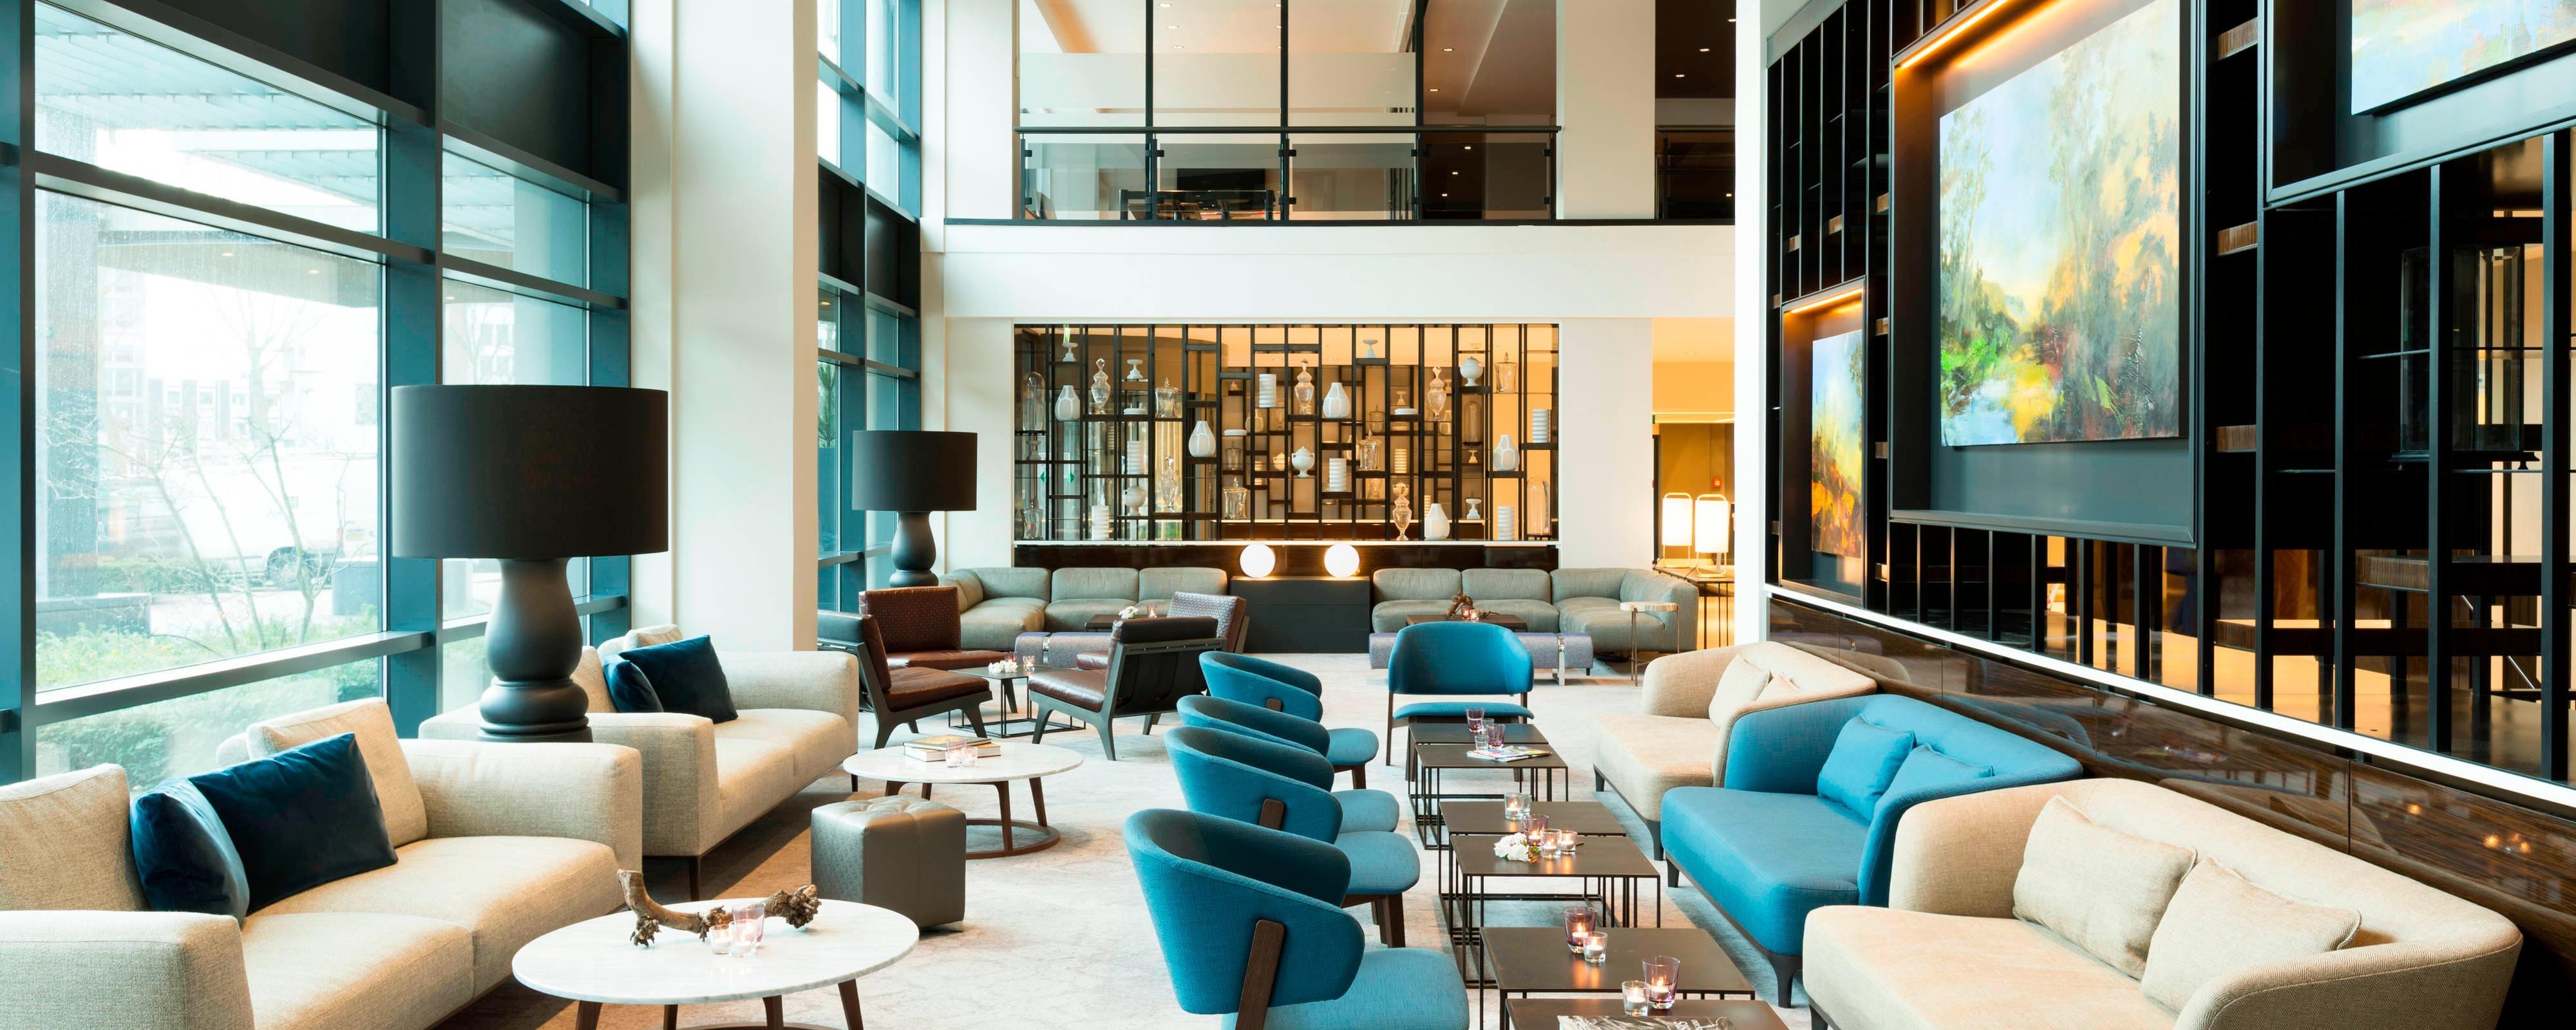 Hotel In The Hague Netherlands The Hague Marriott Hotel